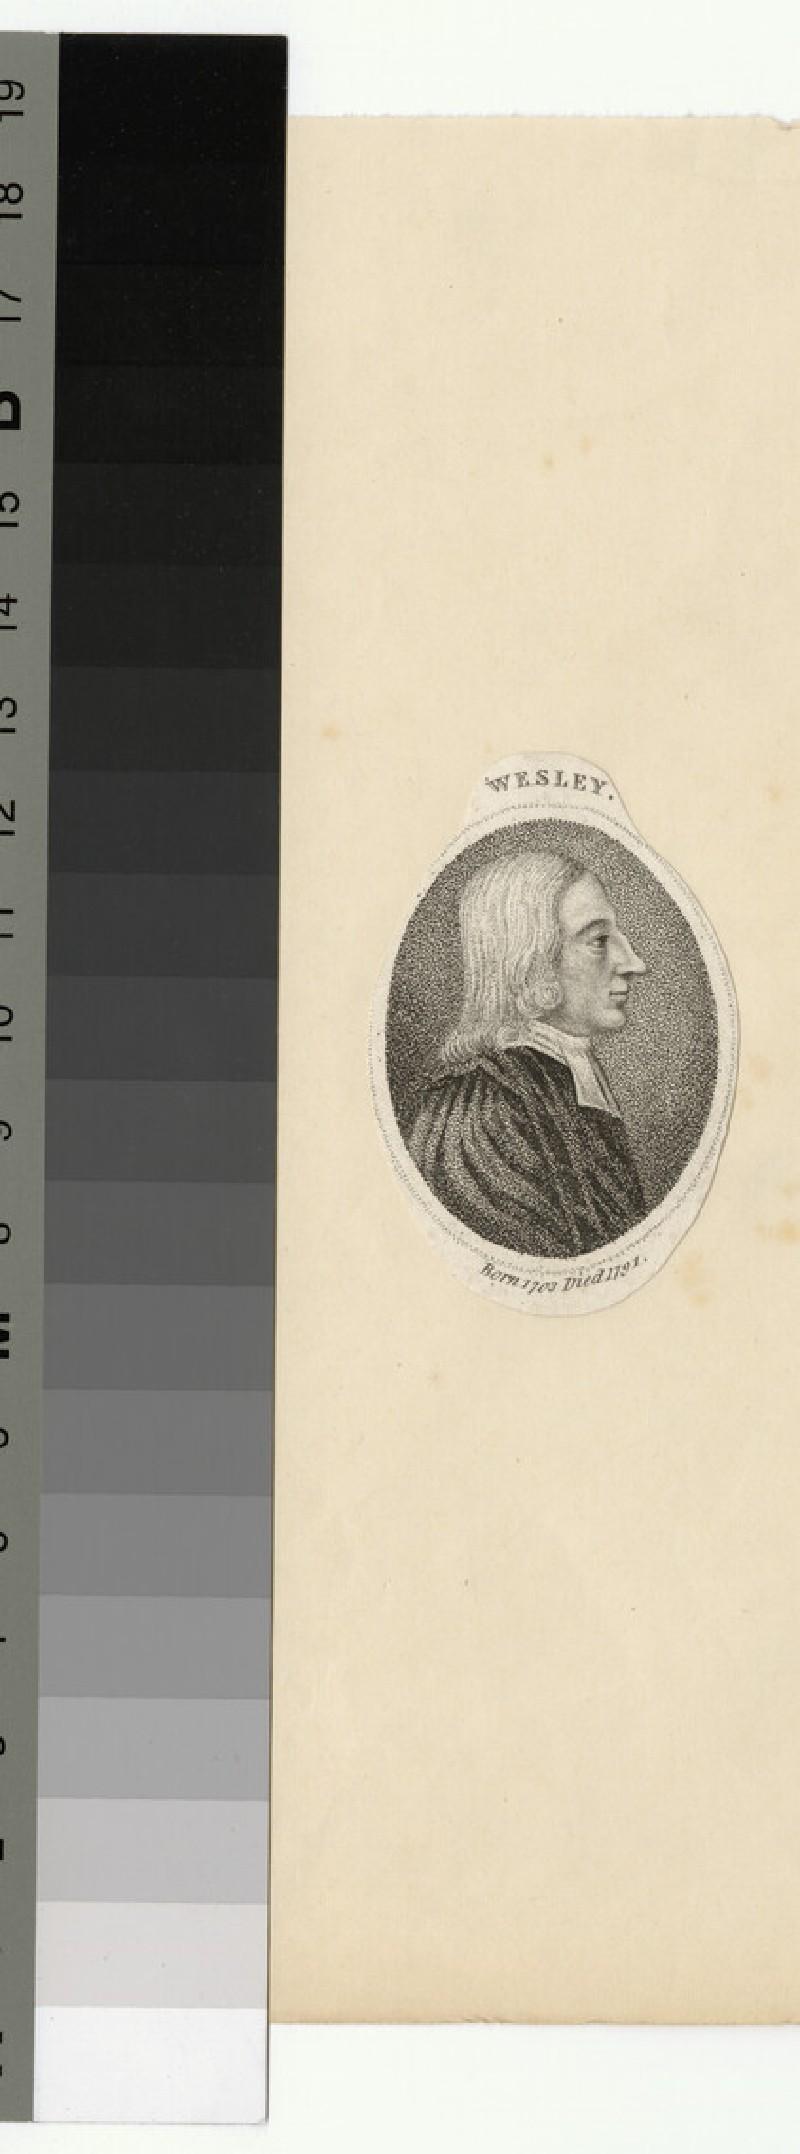 Portrait of J. Wesley